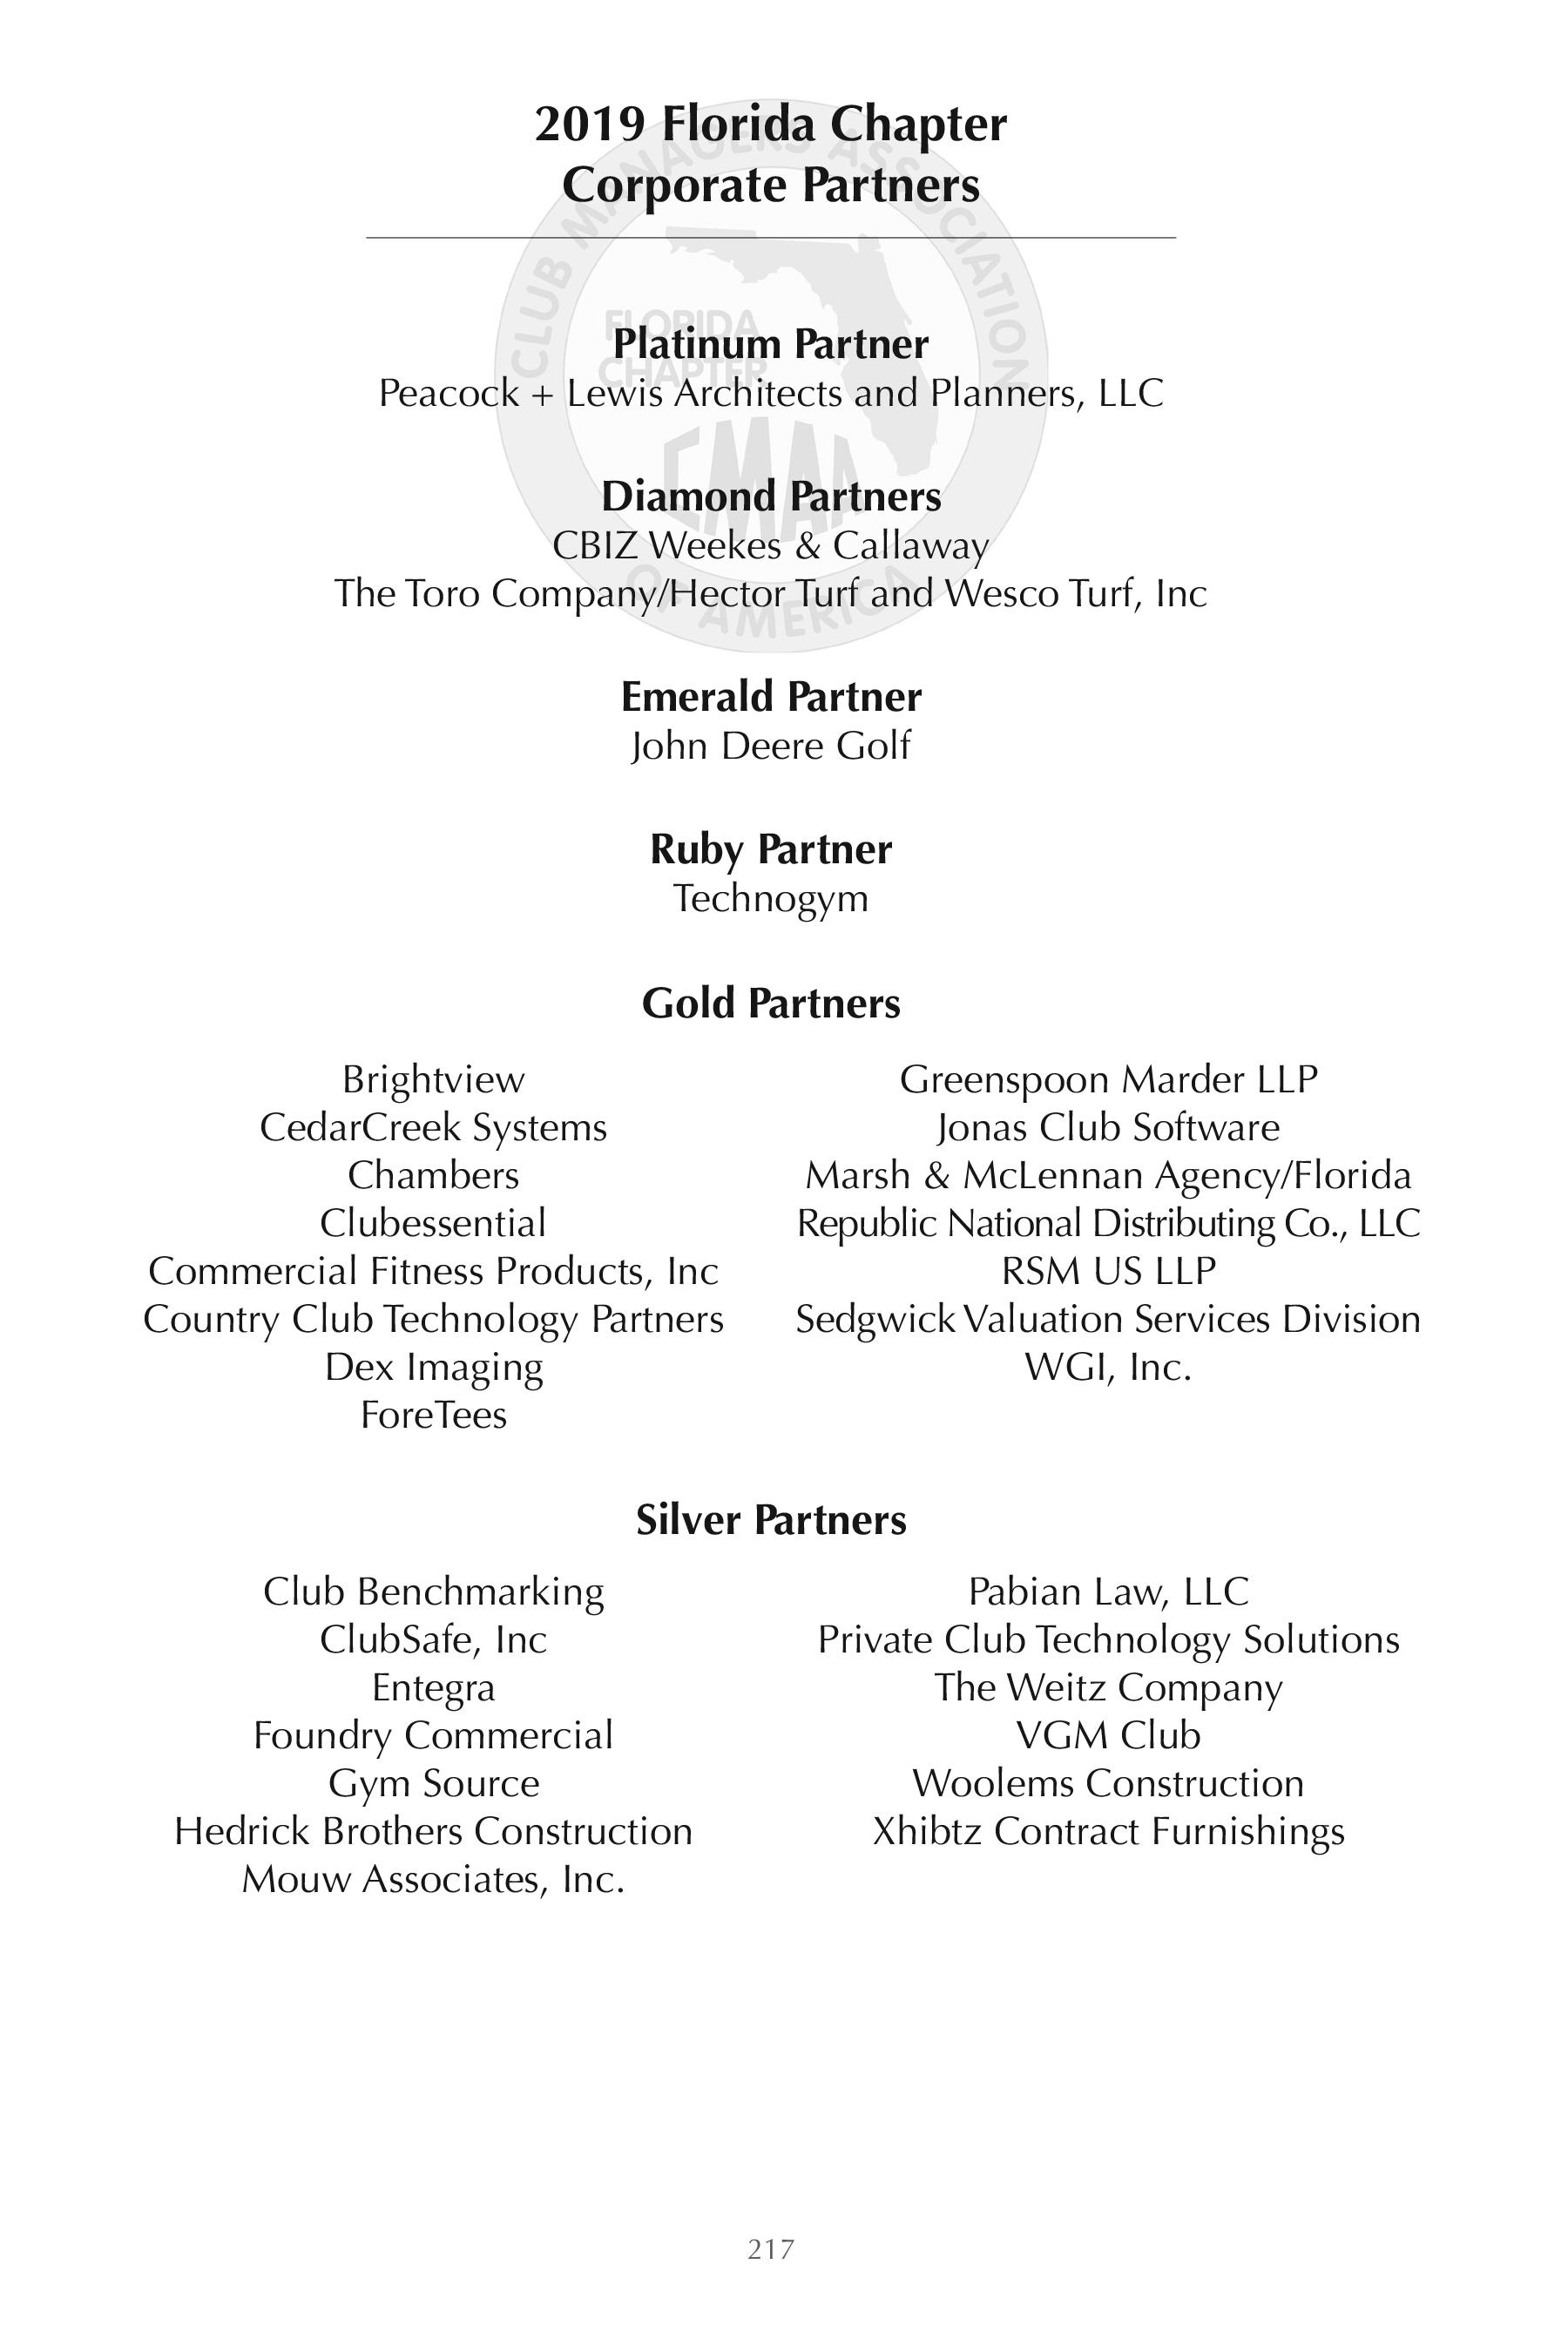 Florida Chapter CMAA Corporate Partner & Directory Sponsors